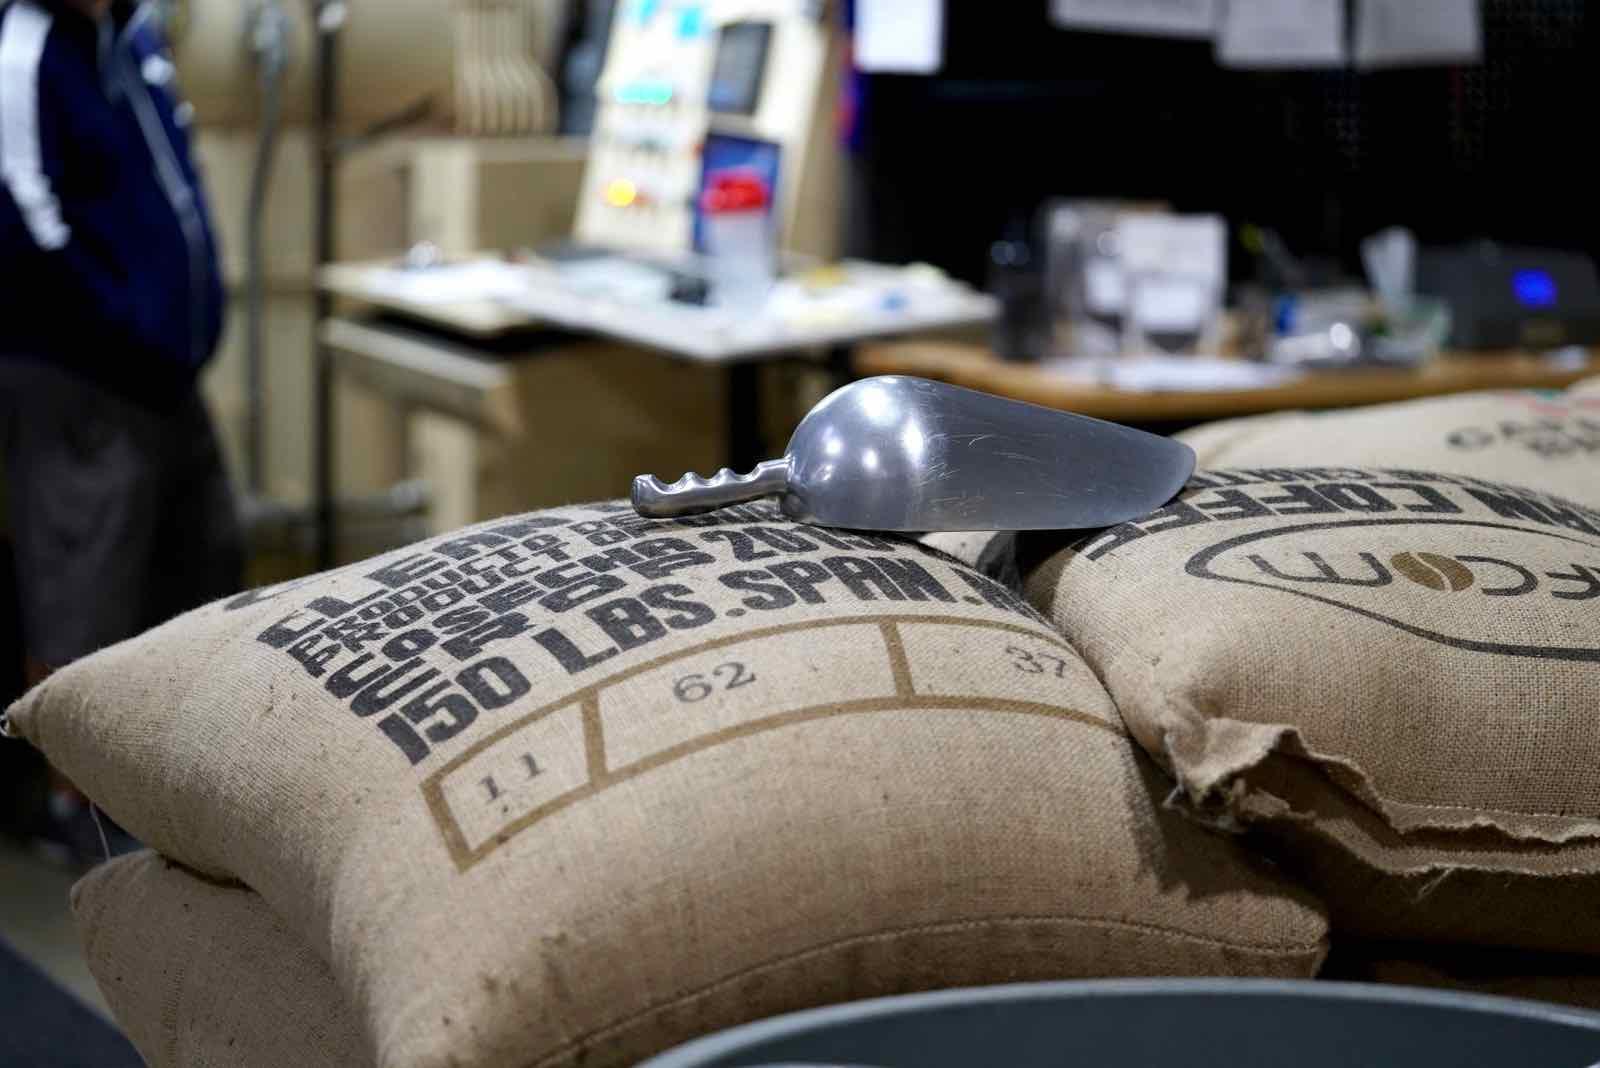 lamill-coffee-factory-tour-7.jpg